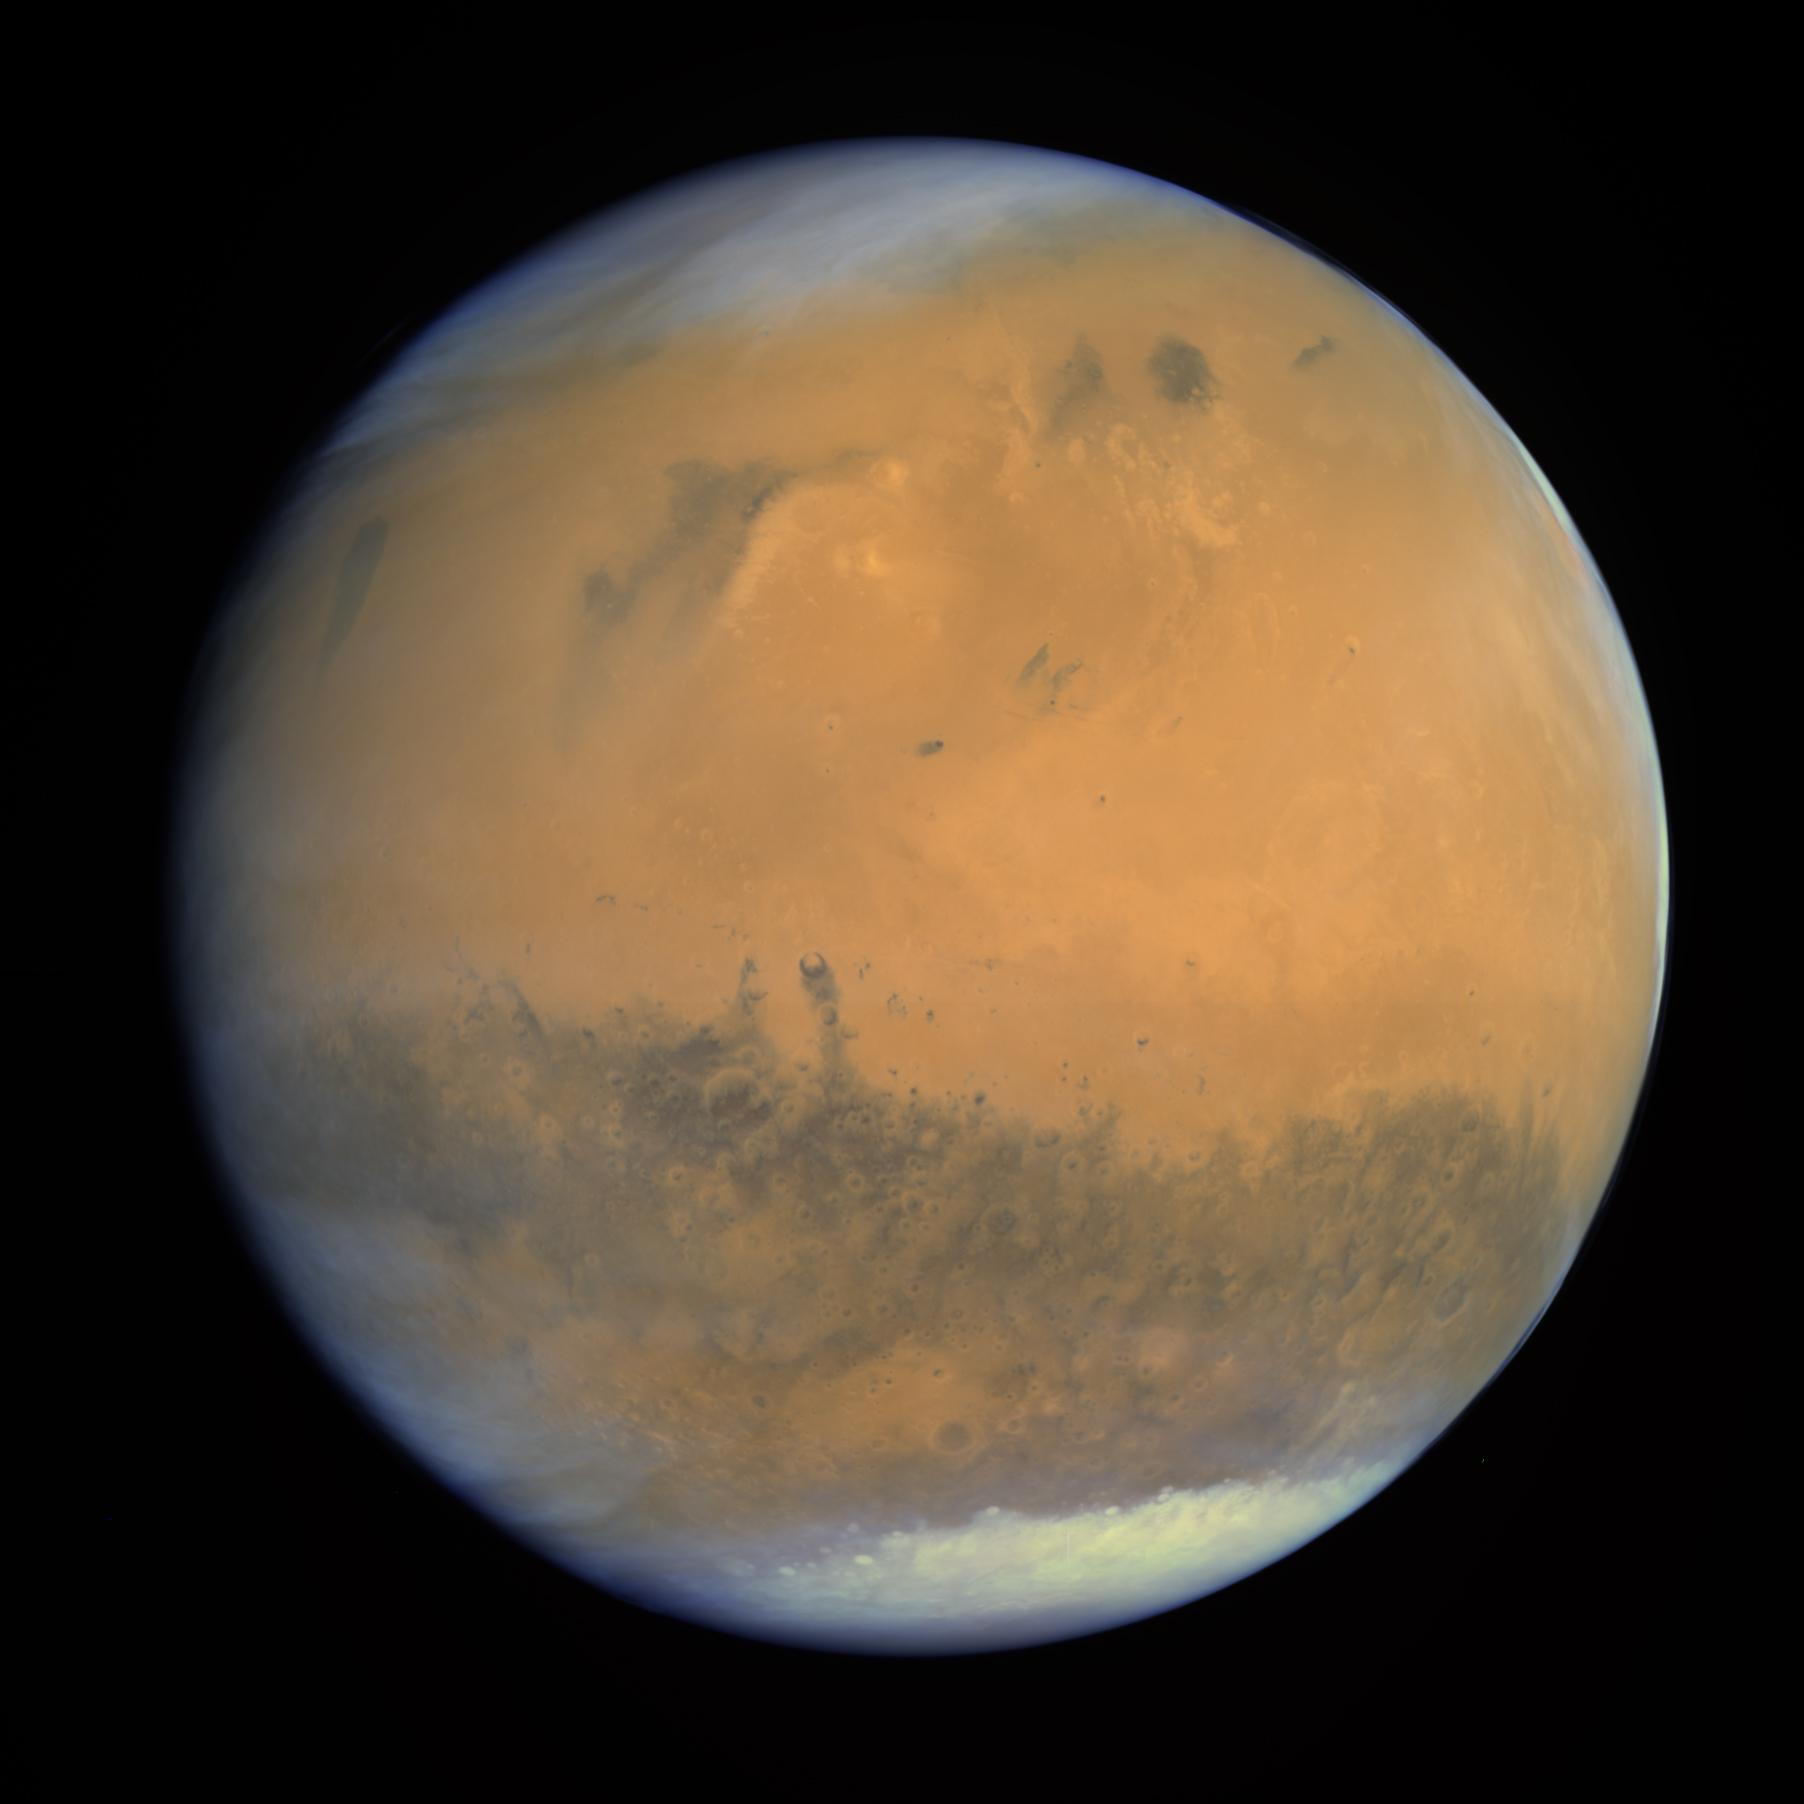 Marte Rosetta